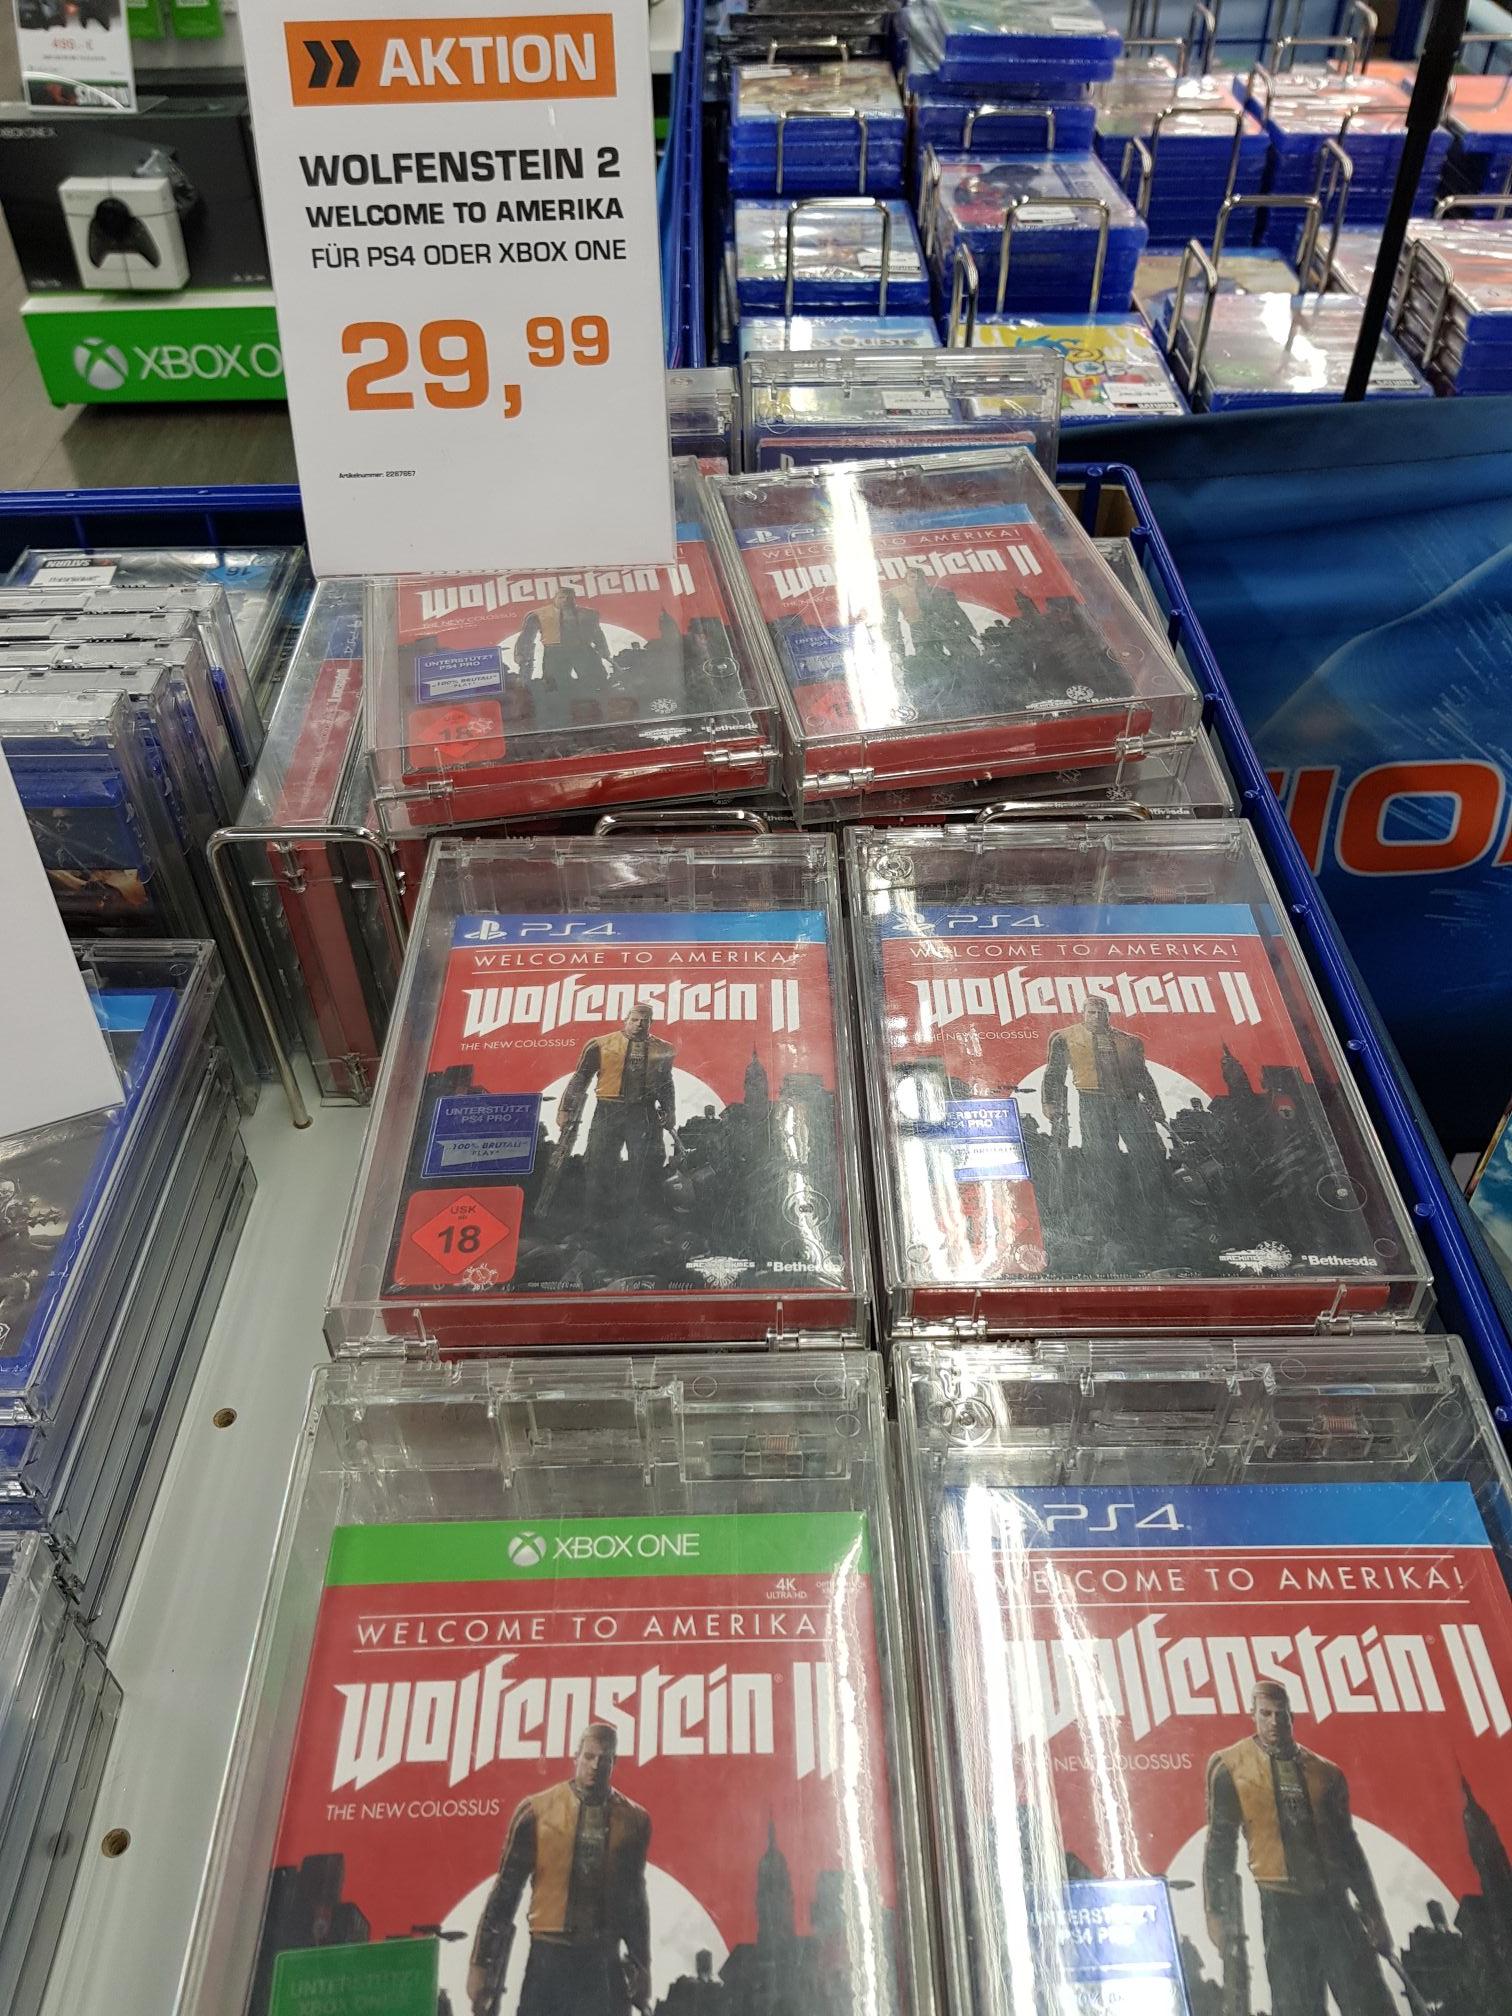 Lokal Berlin: Wolfenstein 2 - The New Colossus (PS4, XOne)